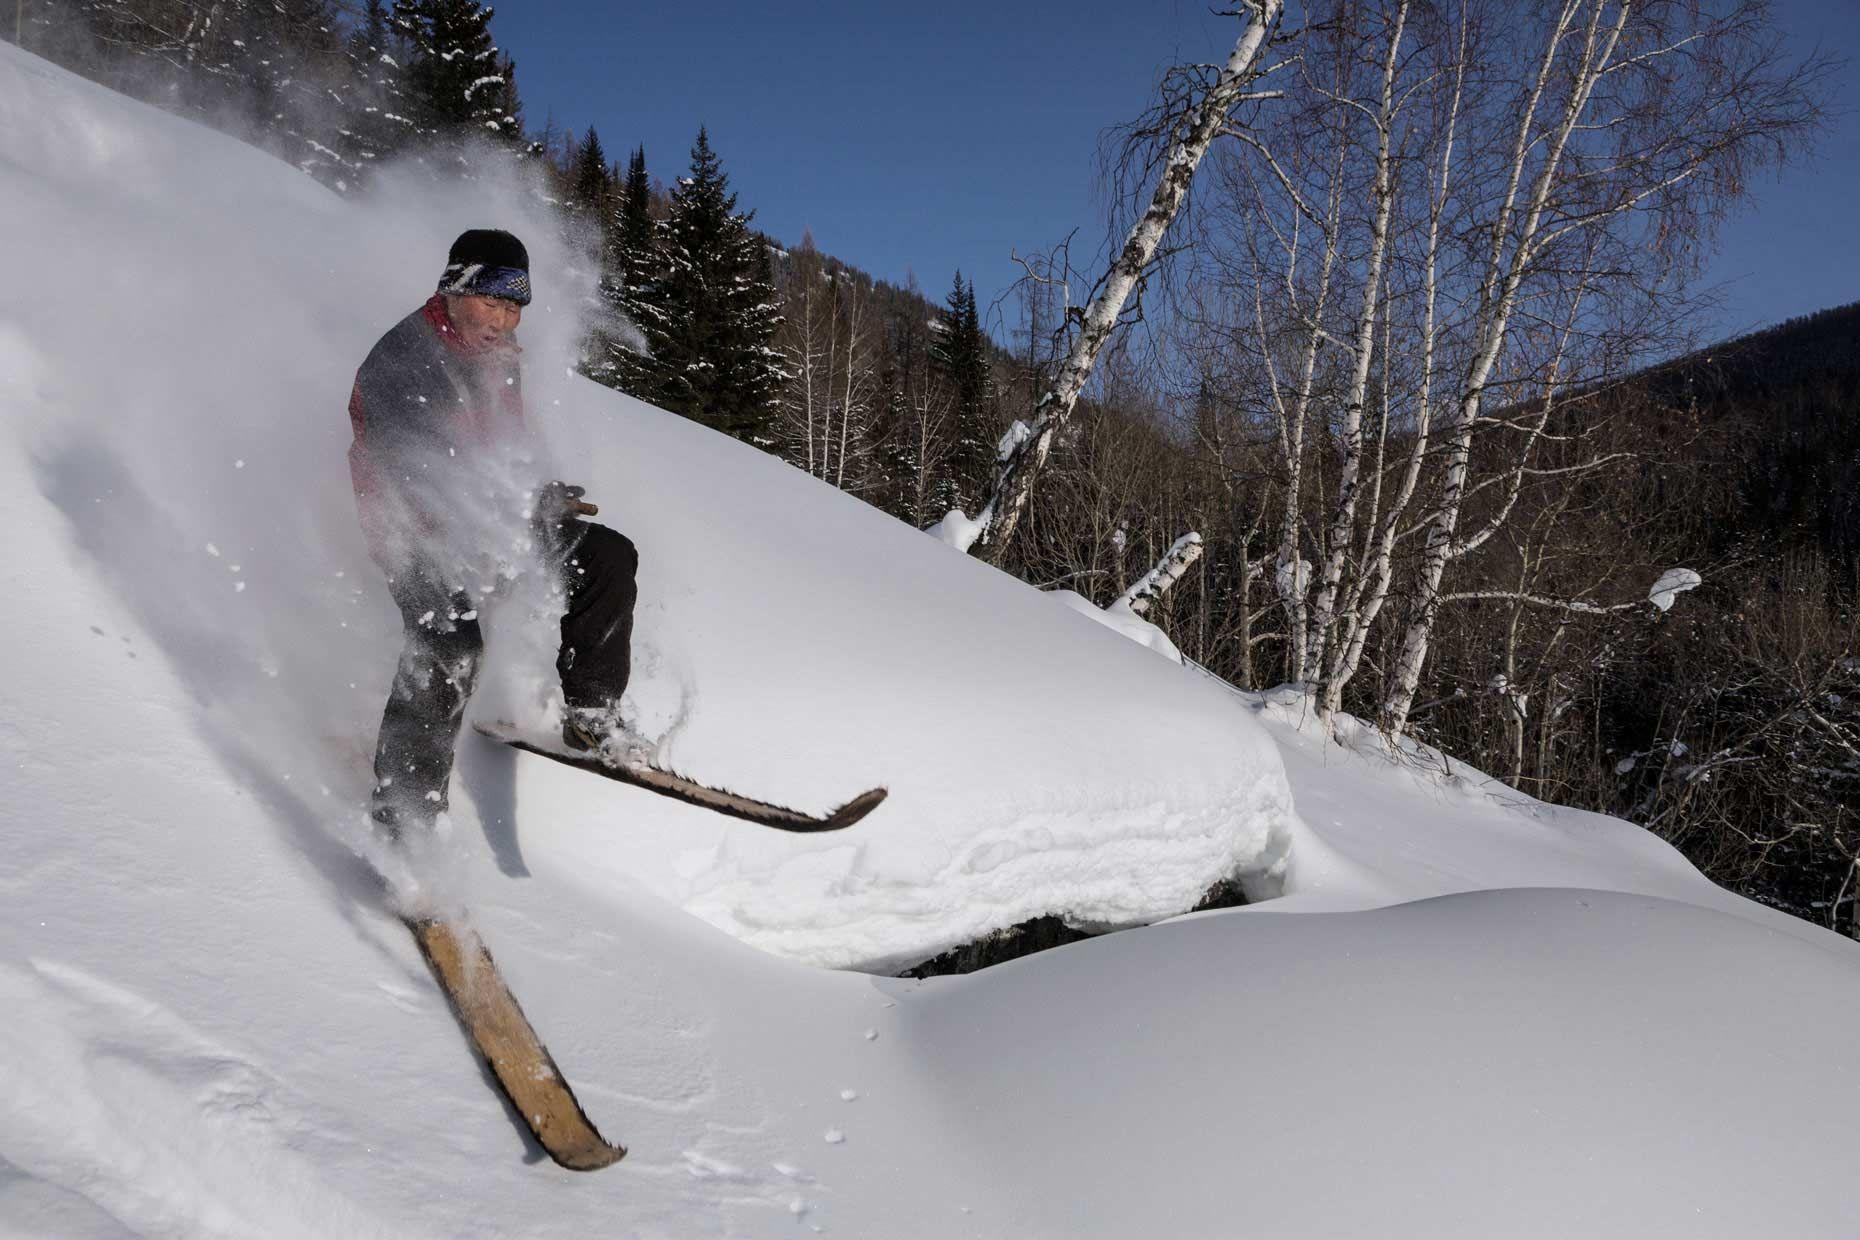 Jonas Bendiksen, Photographer - Last-of-the-First-Skiers - 14 | Skier, Altai mountains, Photographer